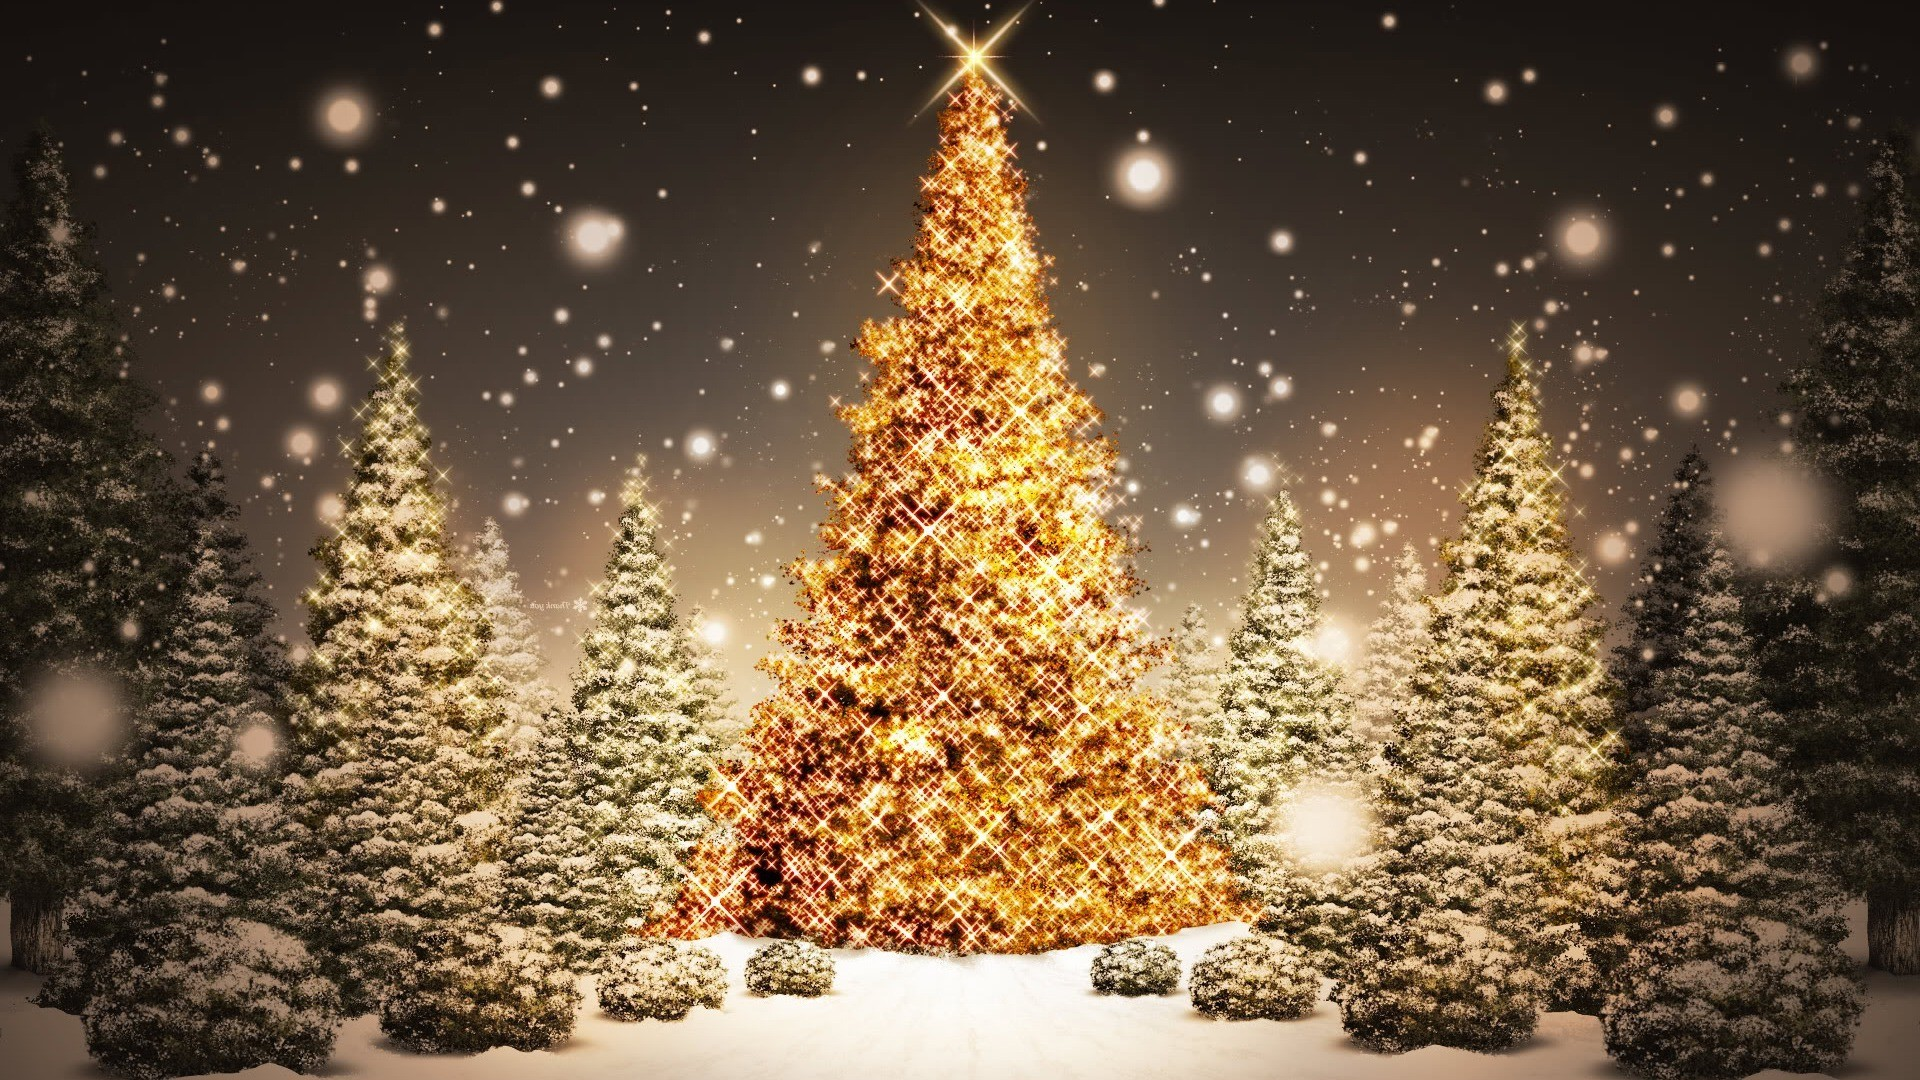 1920x1080 Beautiful Green Merry Christmas Tree HD Wallpaper